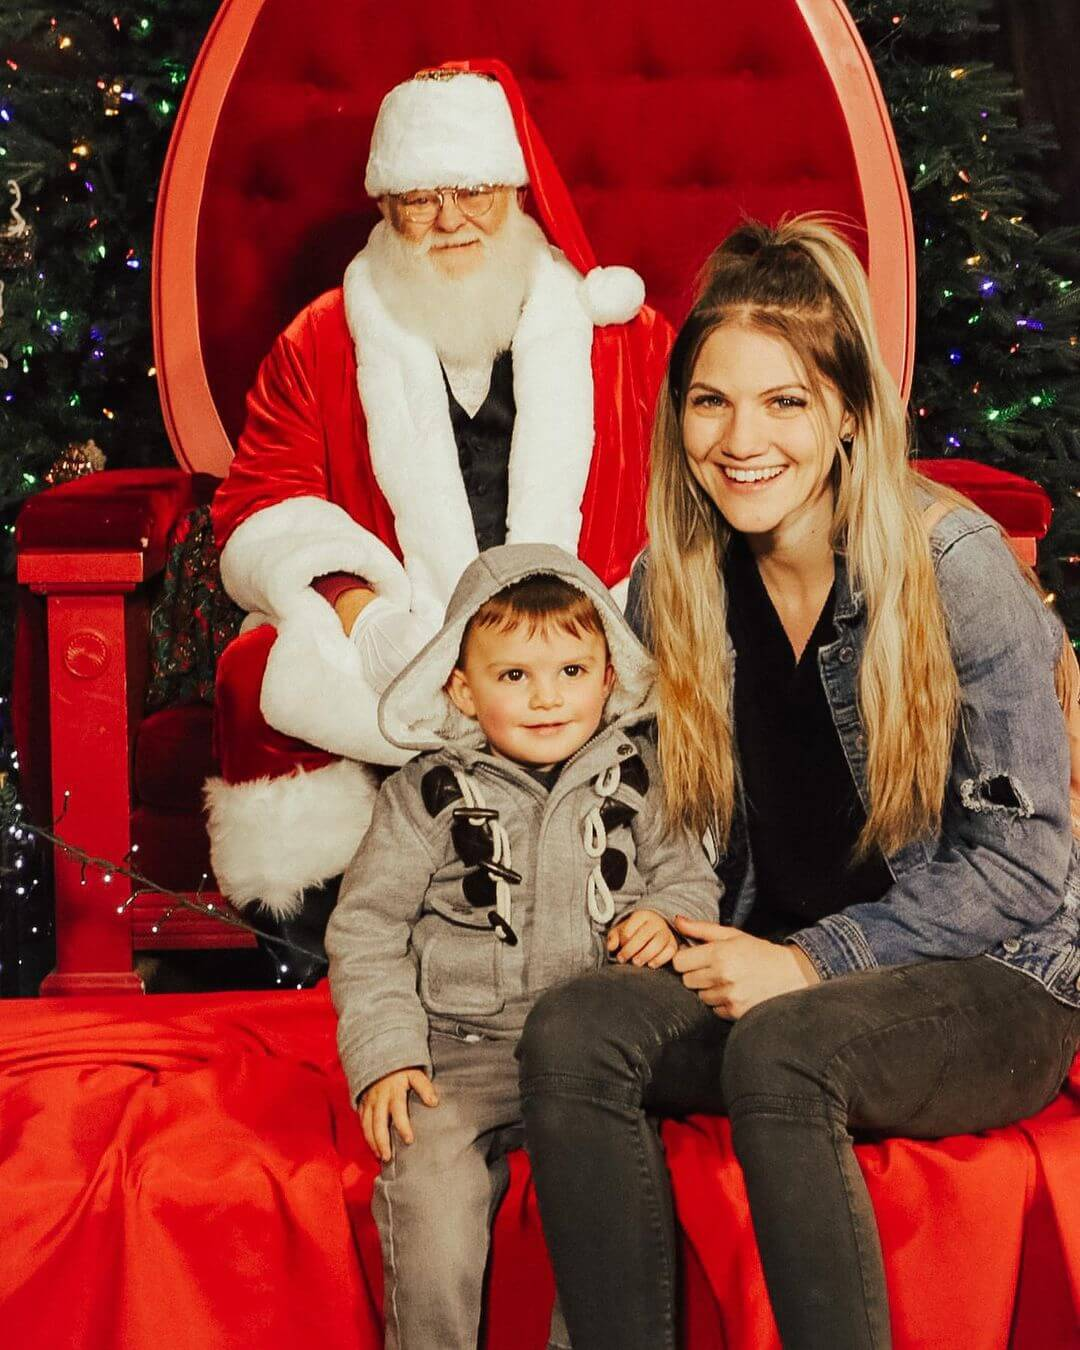 Schnepf Farms Santa photo op